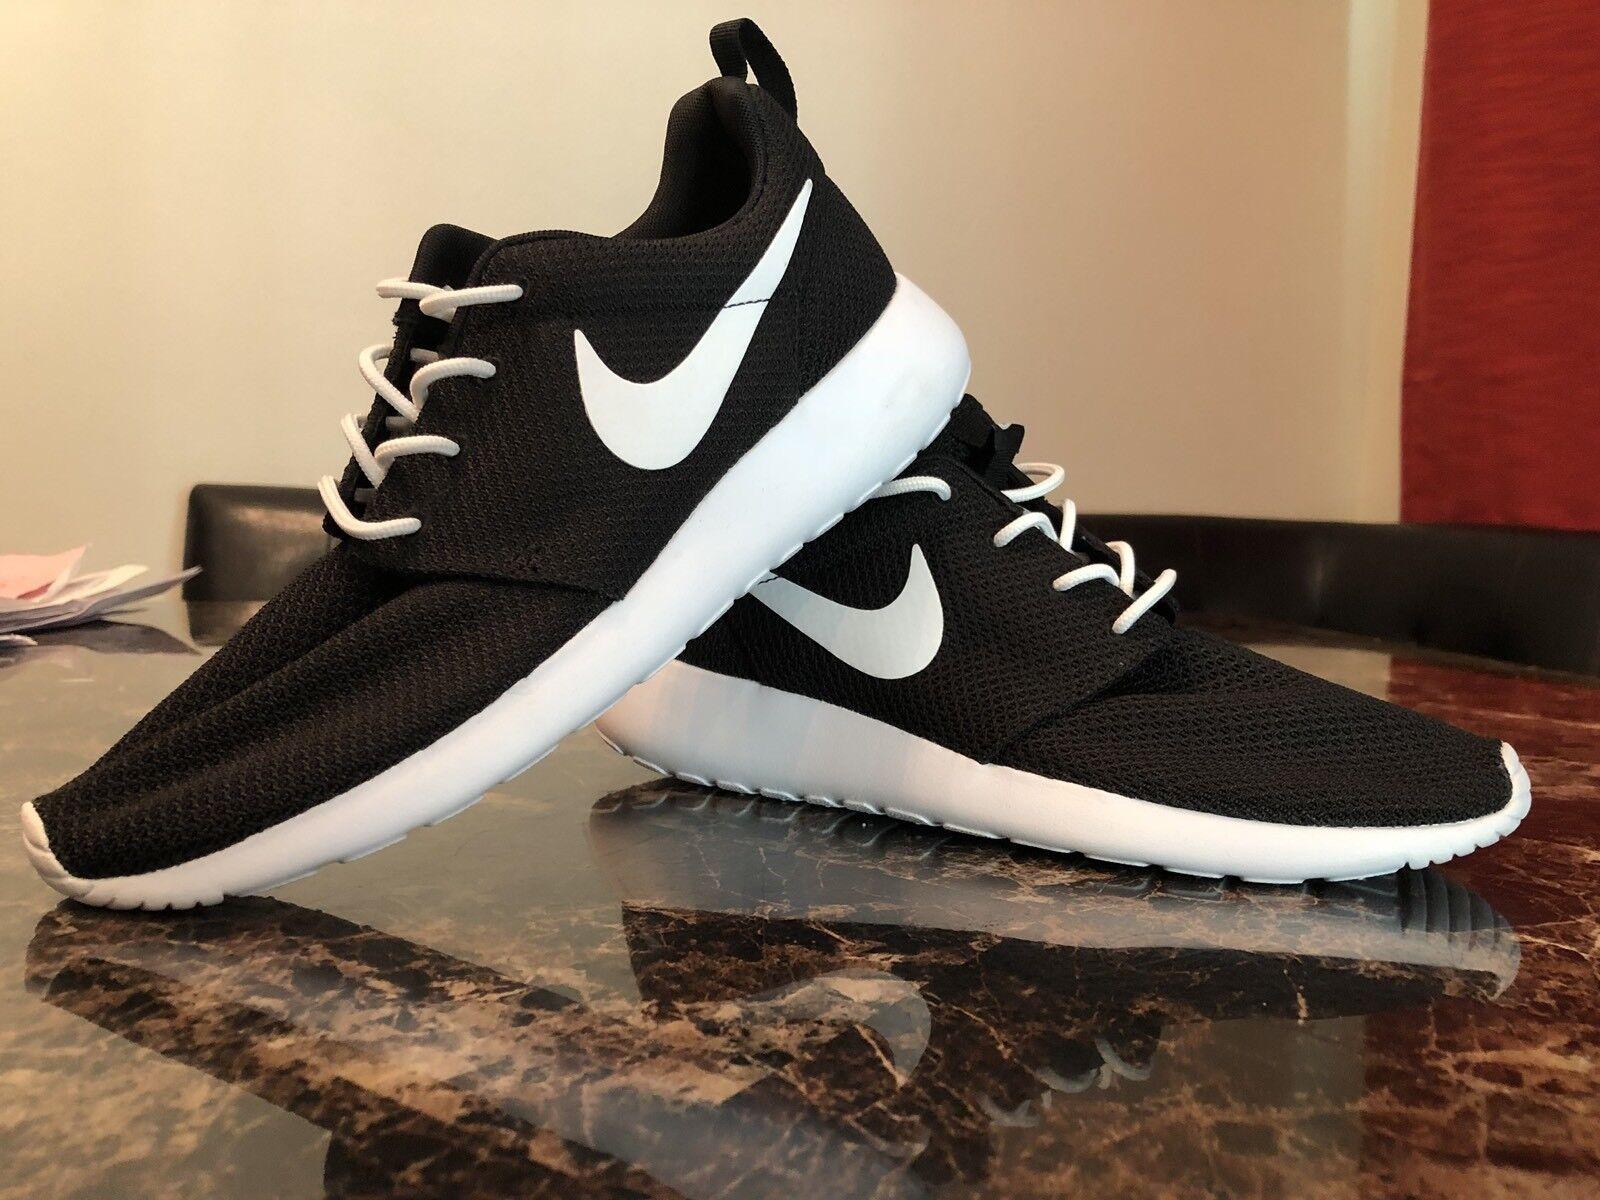 Nike Women's Roshe Run Black And White Size 9.5 Brand New